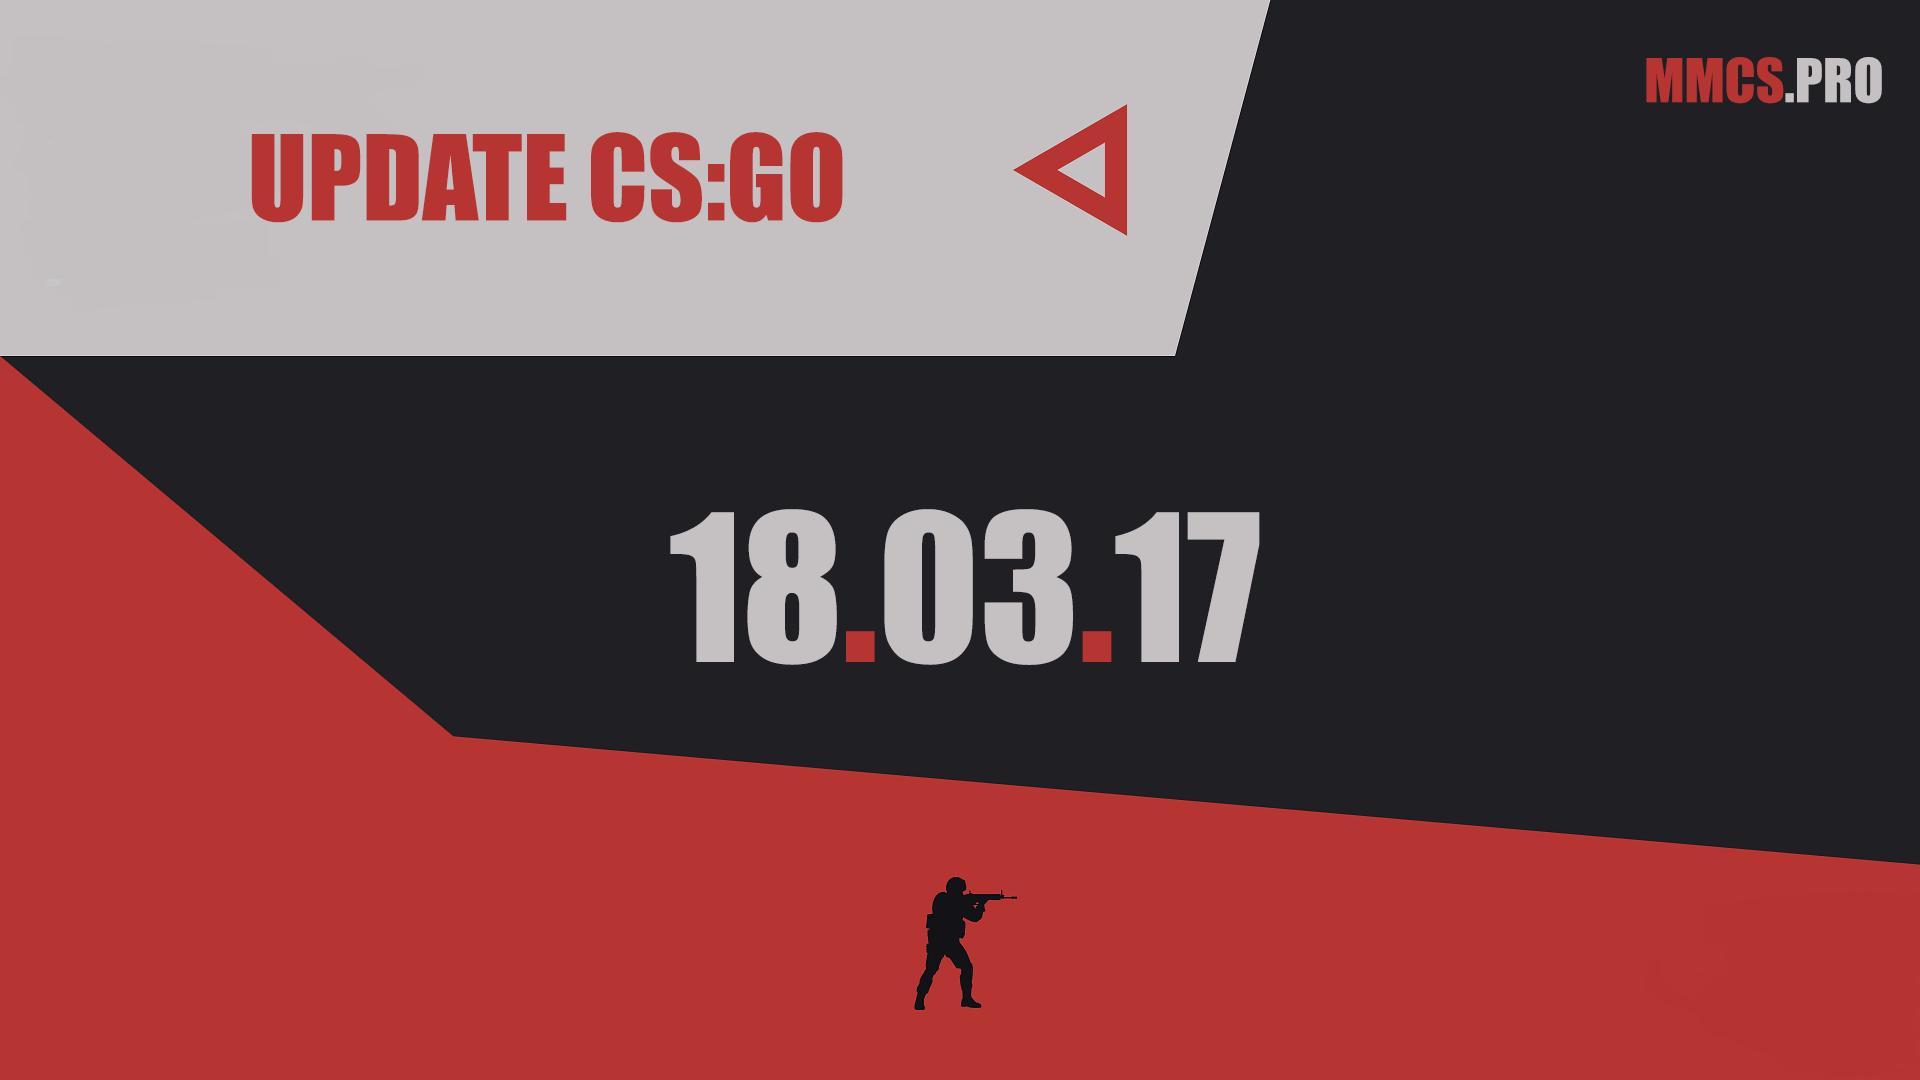 https://mmcs.pro/update-csgo-18-03-2017-valve/